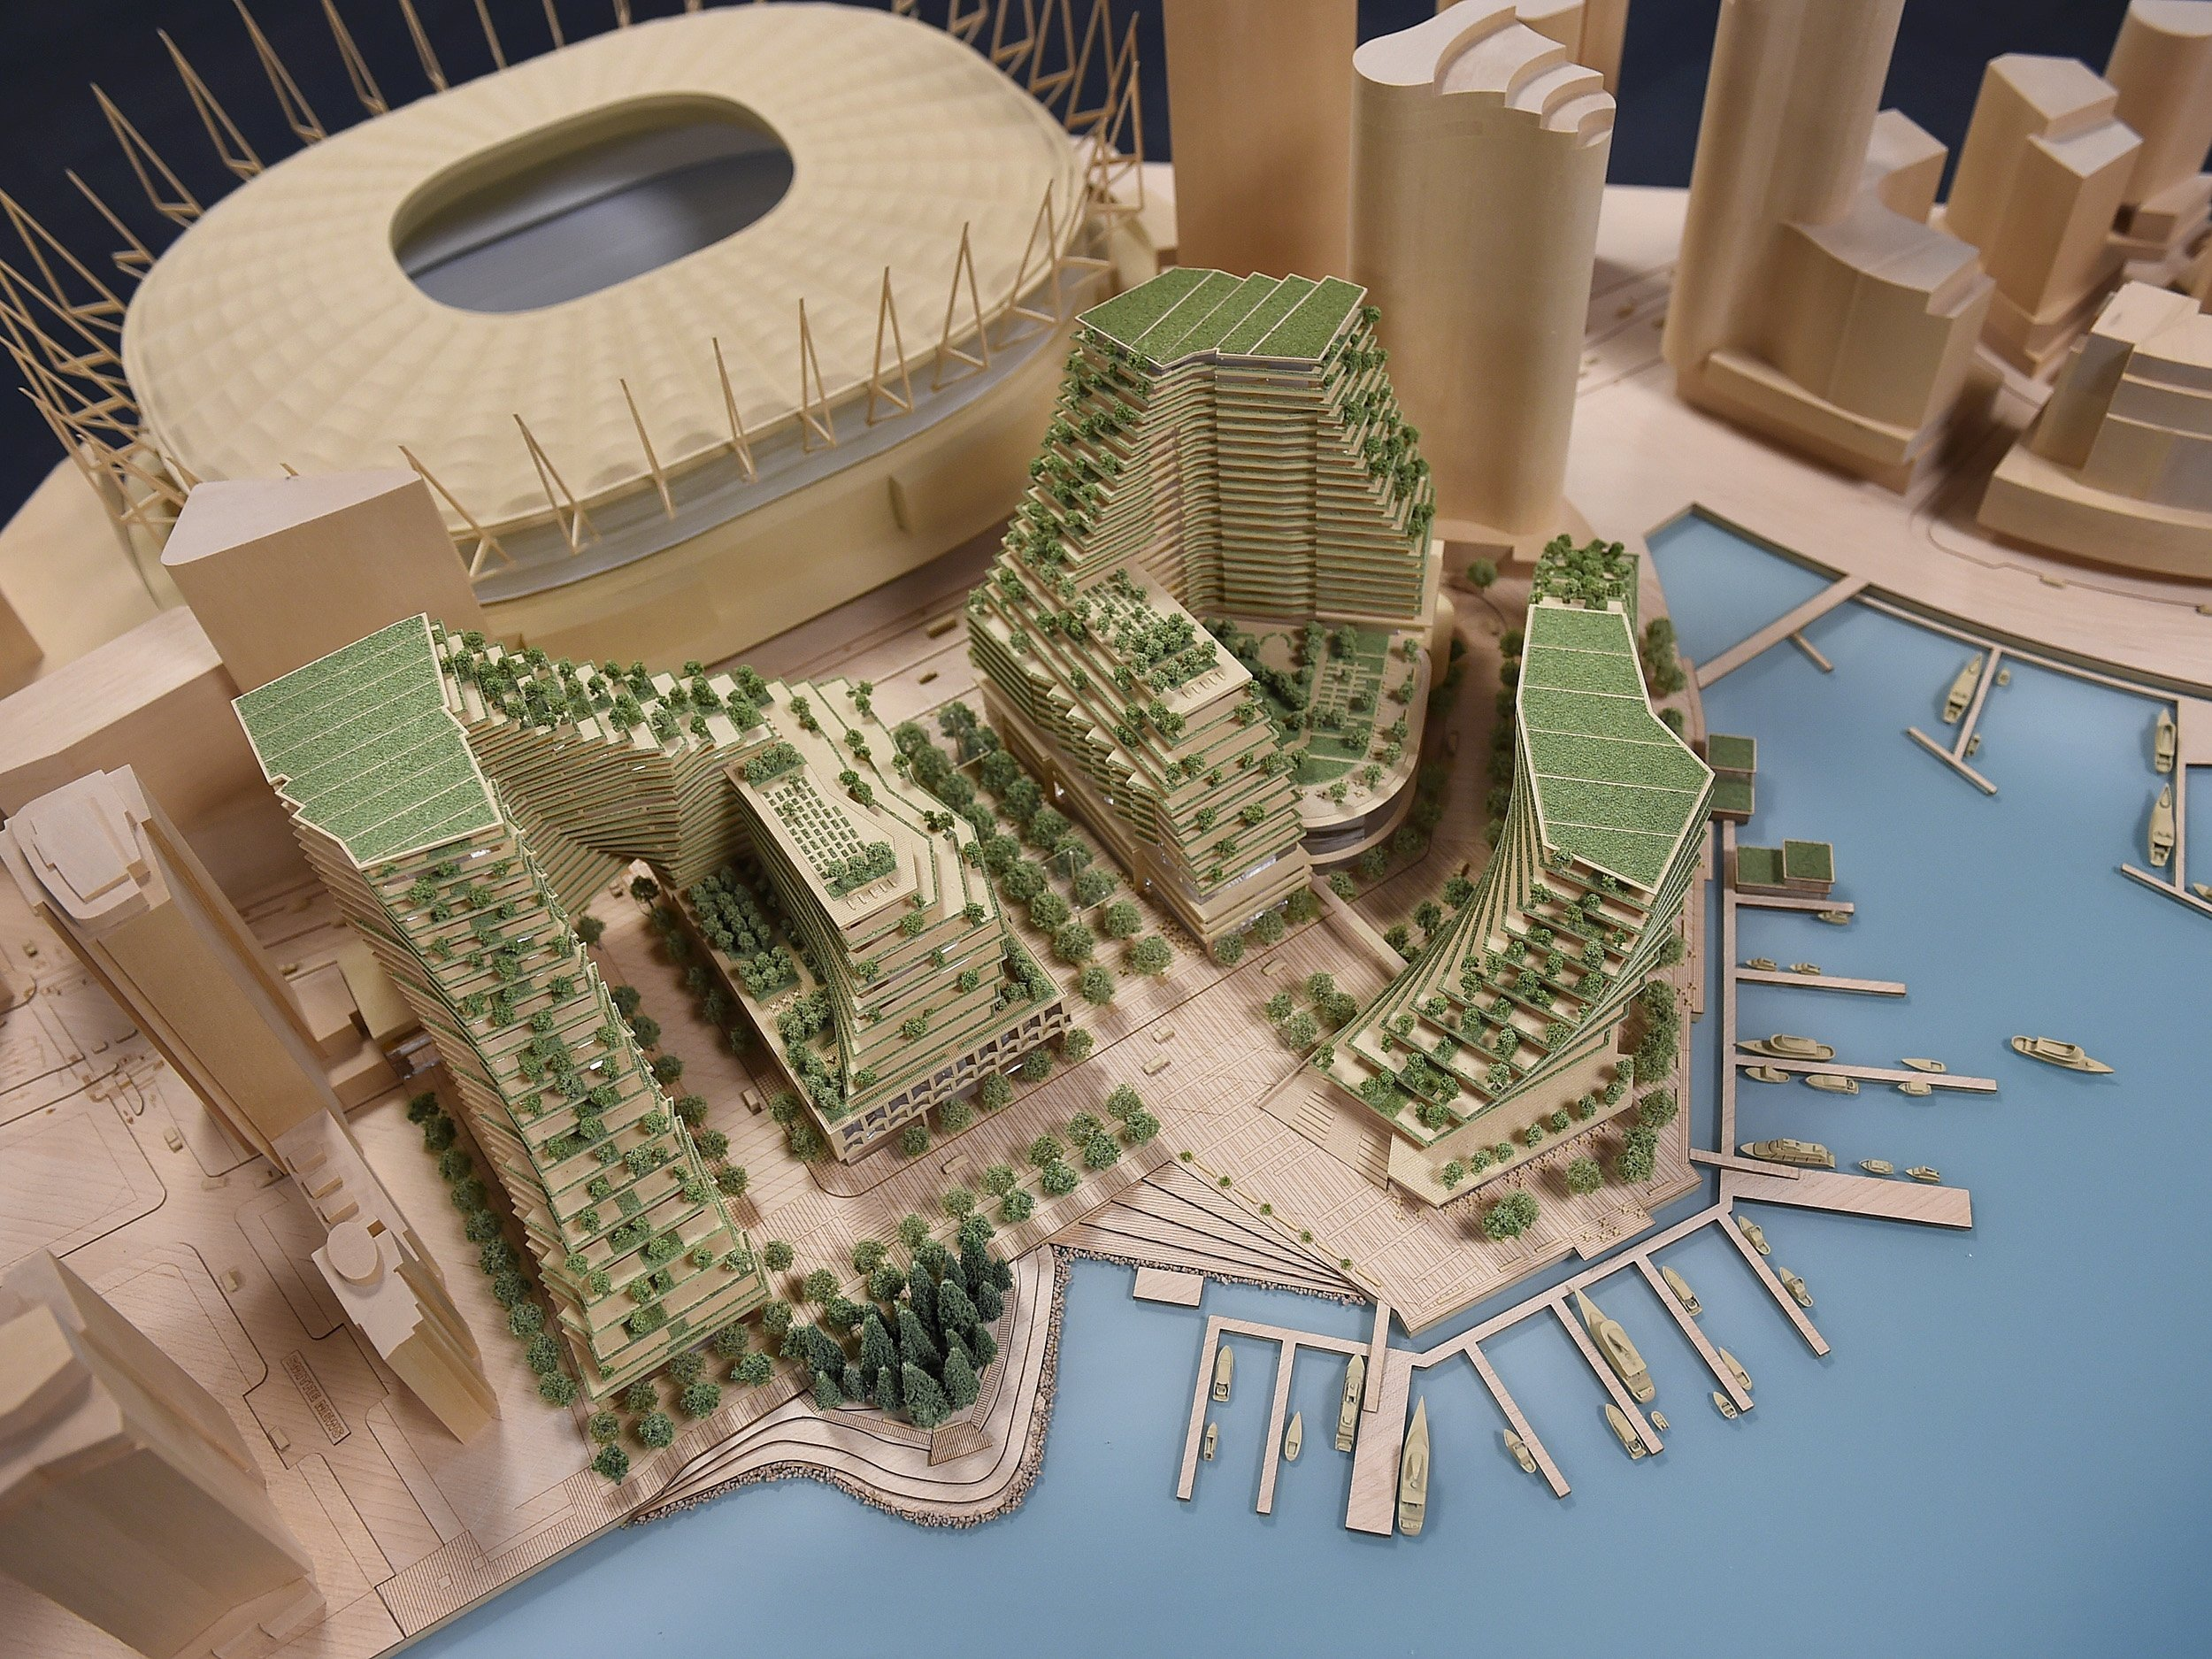 A model of the planned development. Photo Dan Toulgoet !